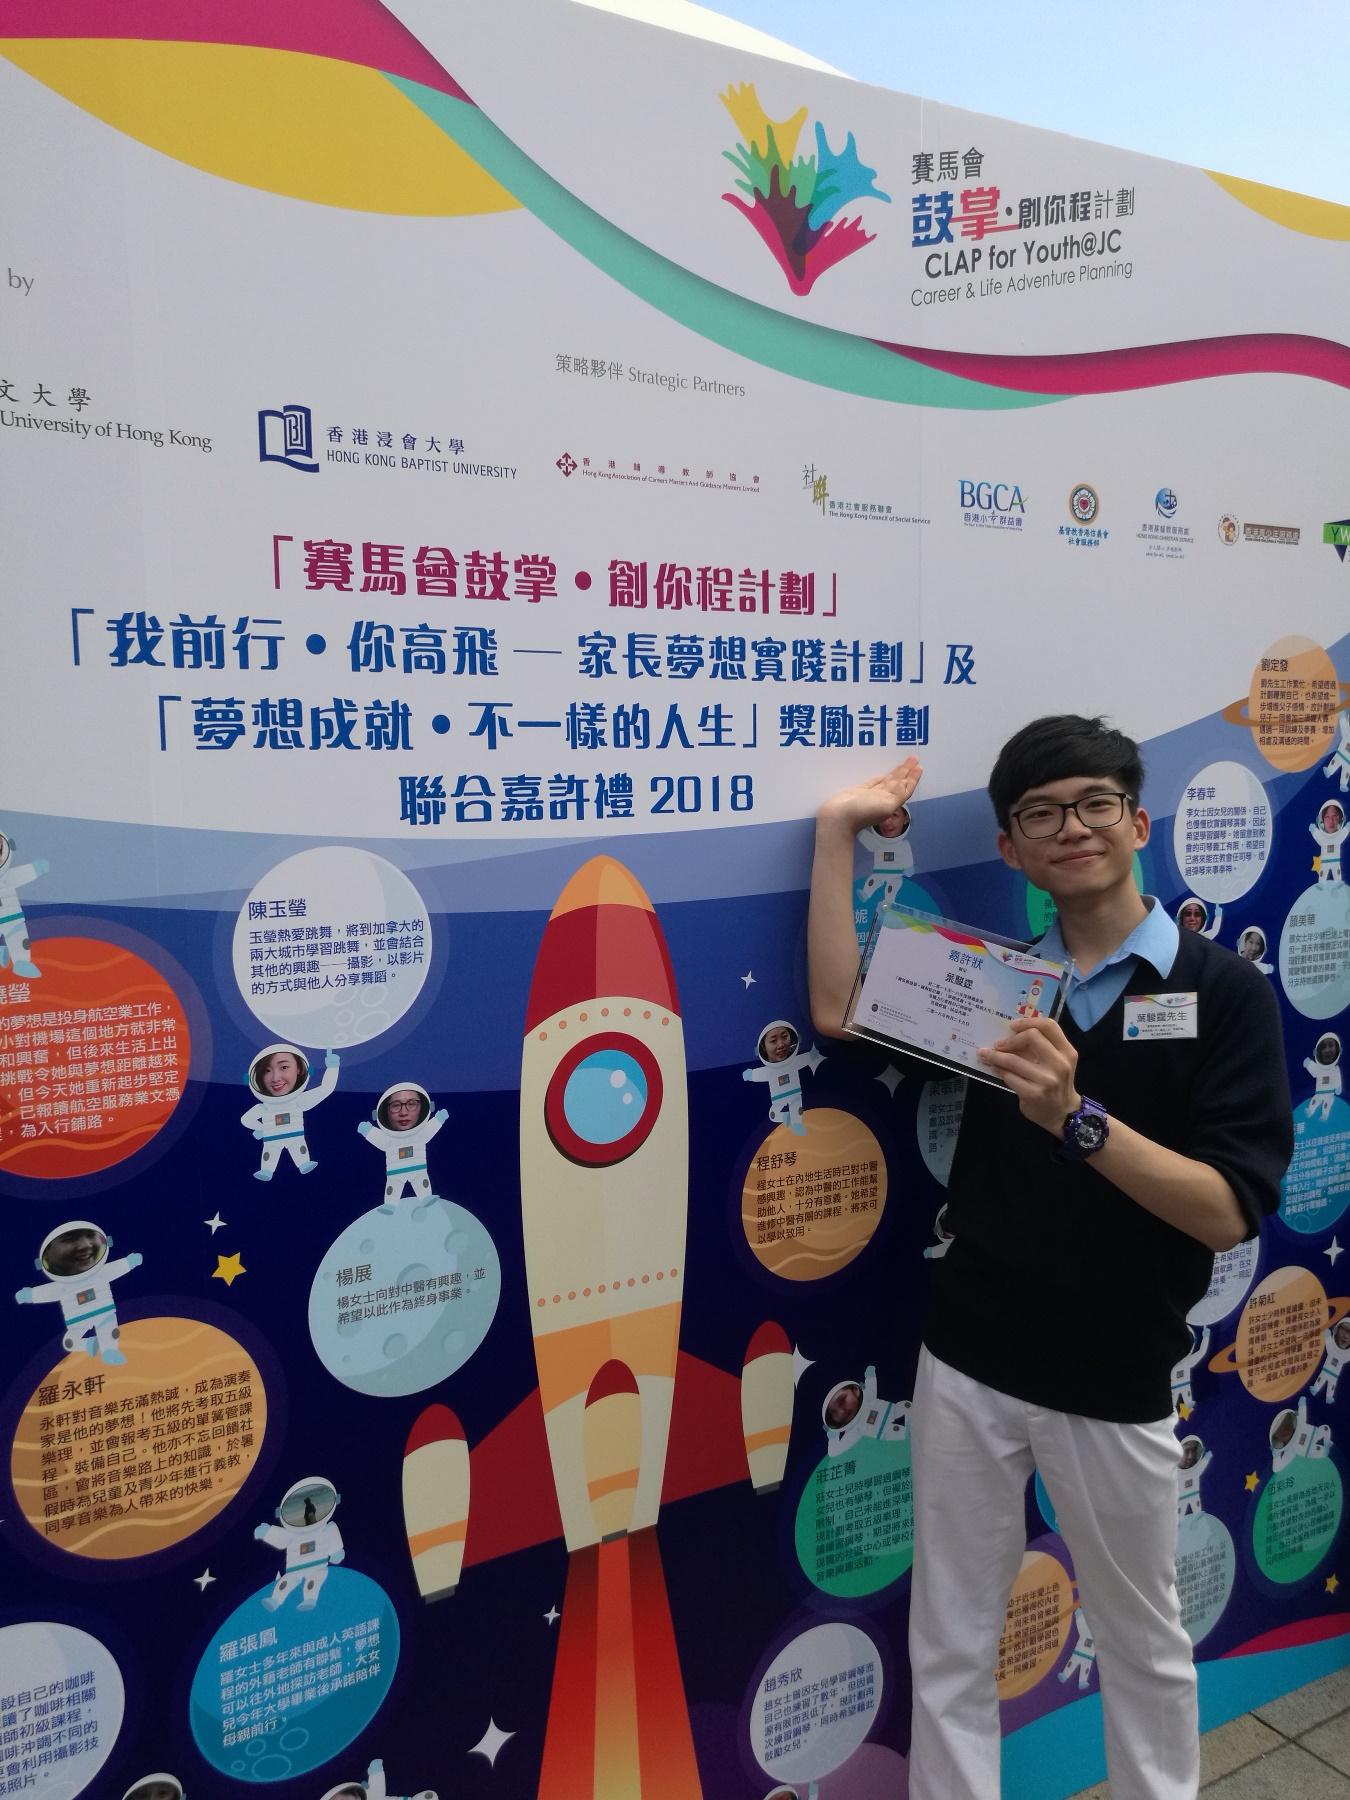 http://npc.edu.hk/sites/default/files/img_20180429_170123.jpg